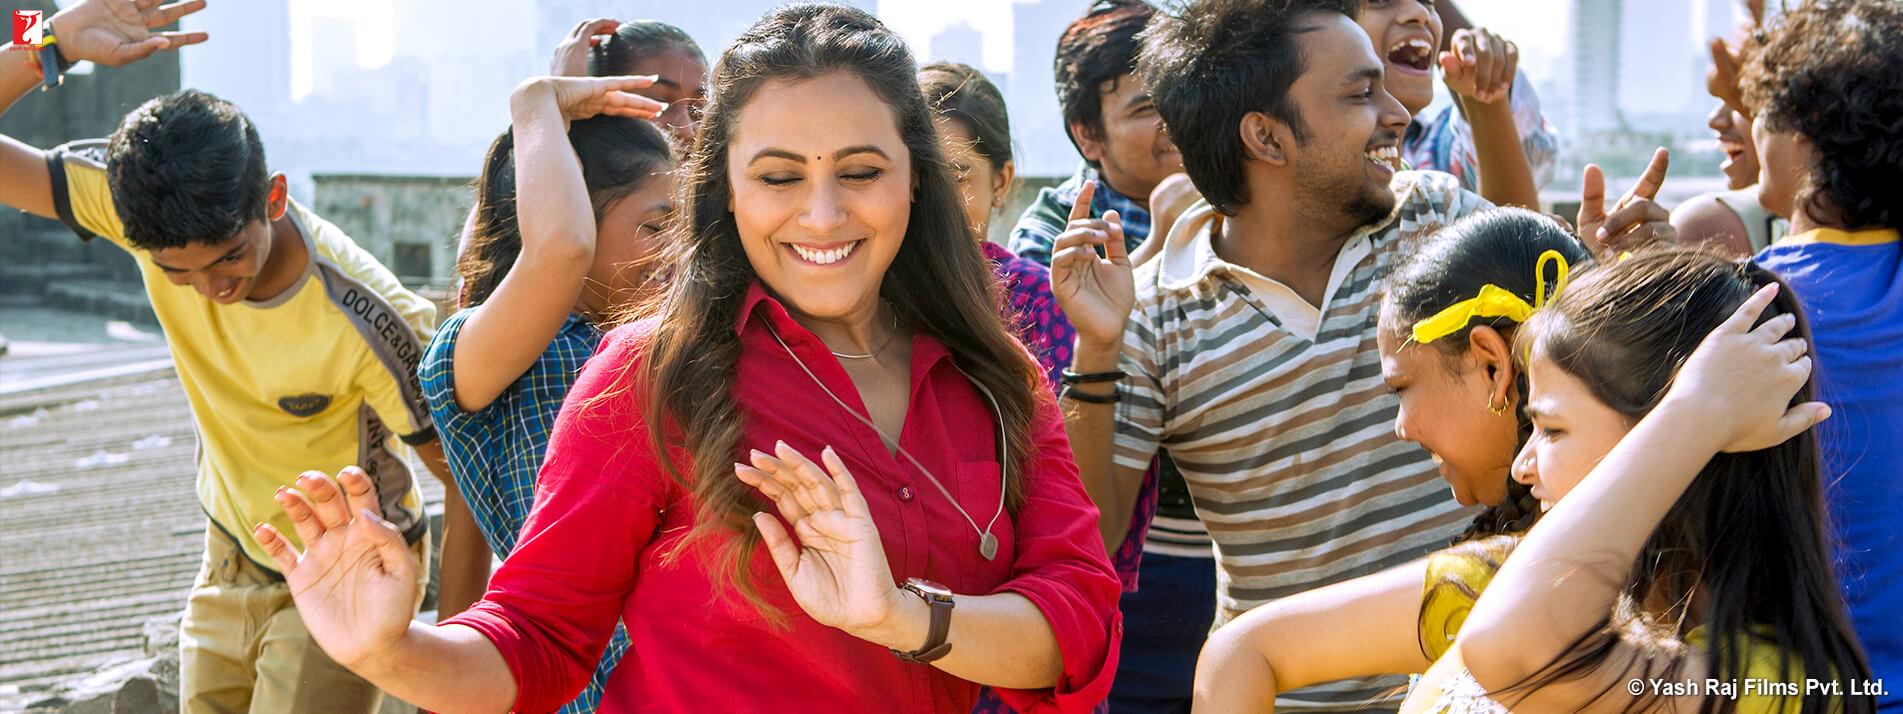 hichki (hindi-2018) full movie download 720p hd filmywap | xmovies8